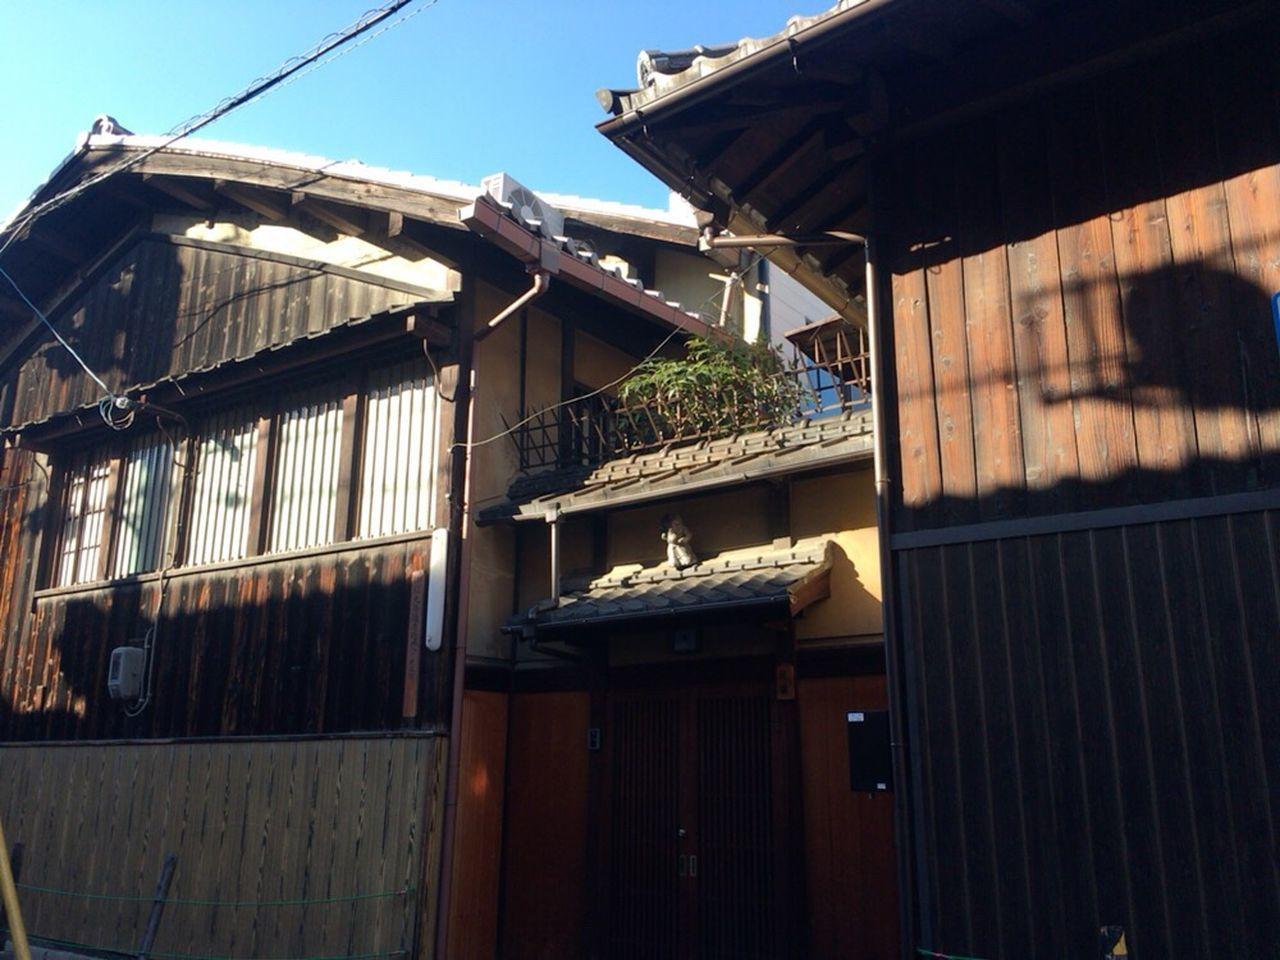 Kyoto City Kyoto Tradisional Kyoto Tradisional House Kyoto Tradisional Street Kyoto Matiya Matiya Kyoto Japan